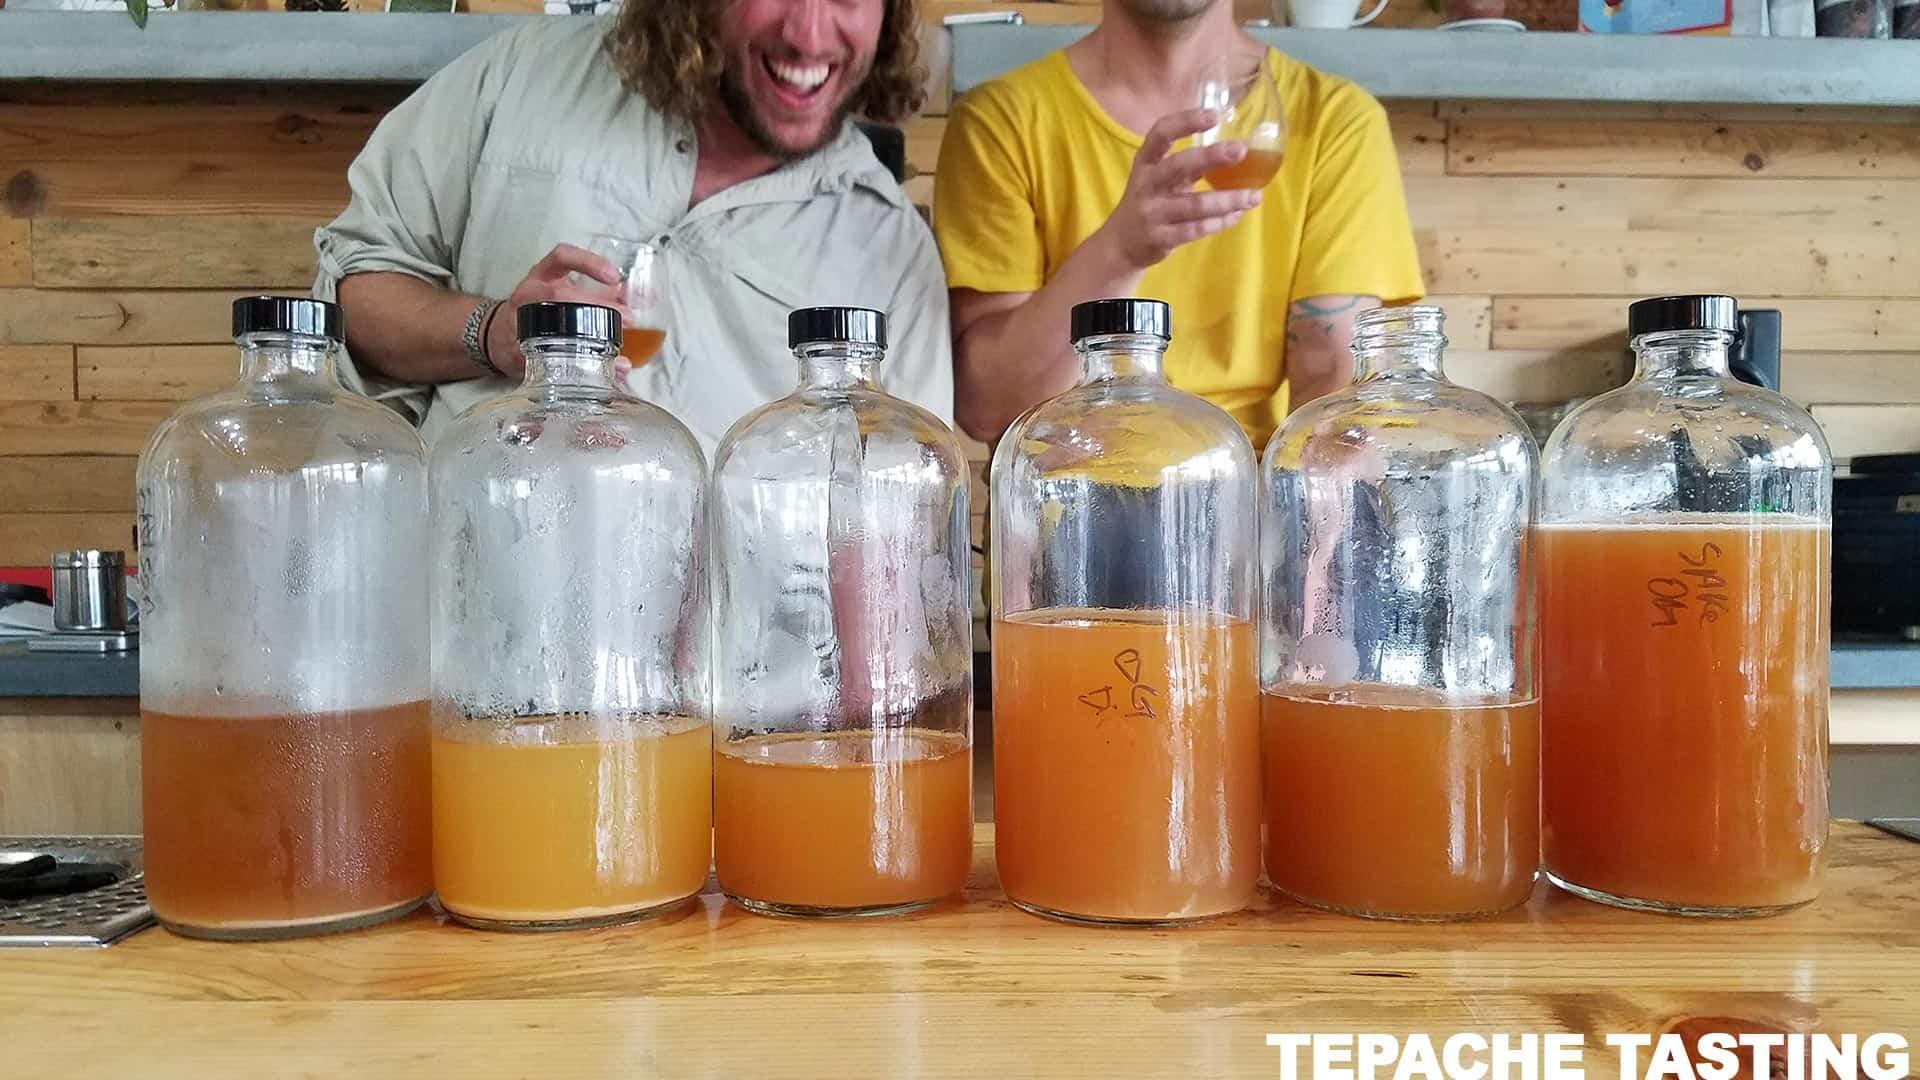 Tepache Tasting with Josh & Carlos